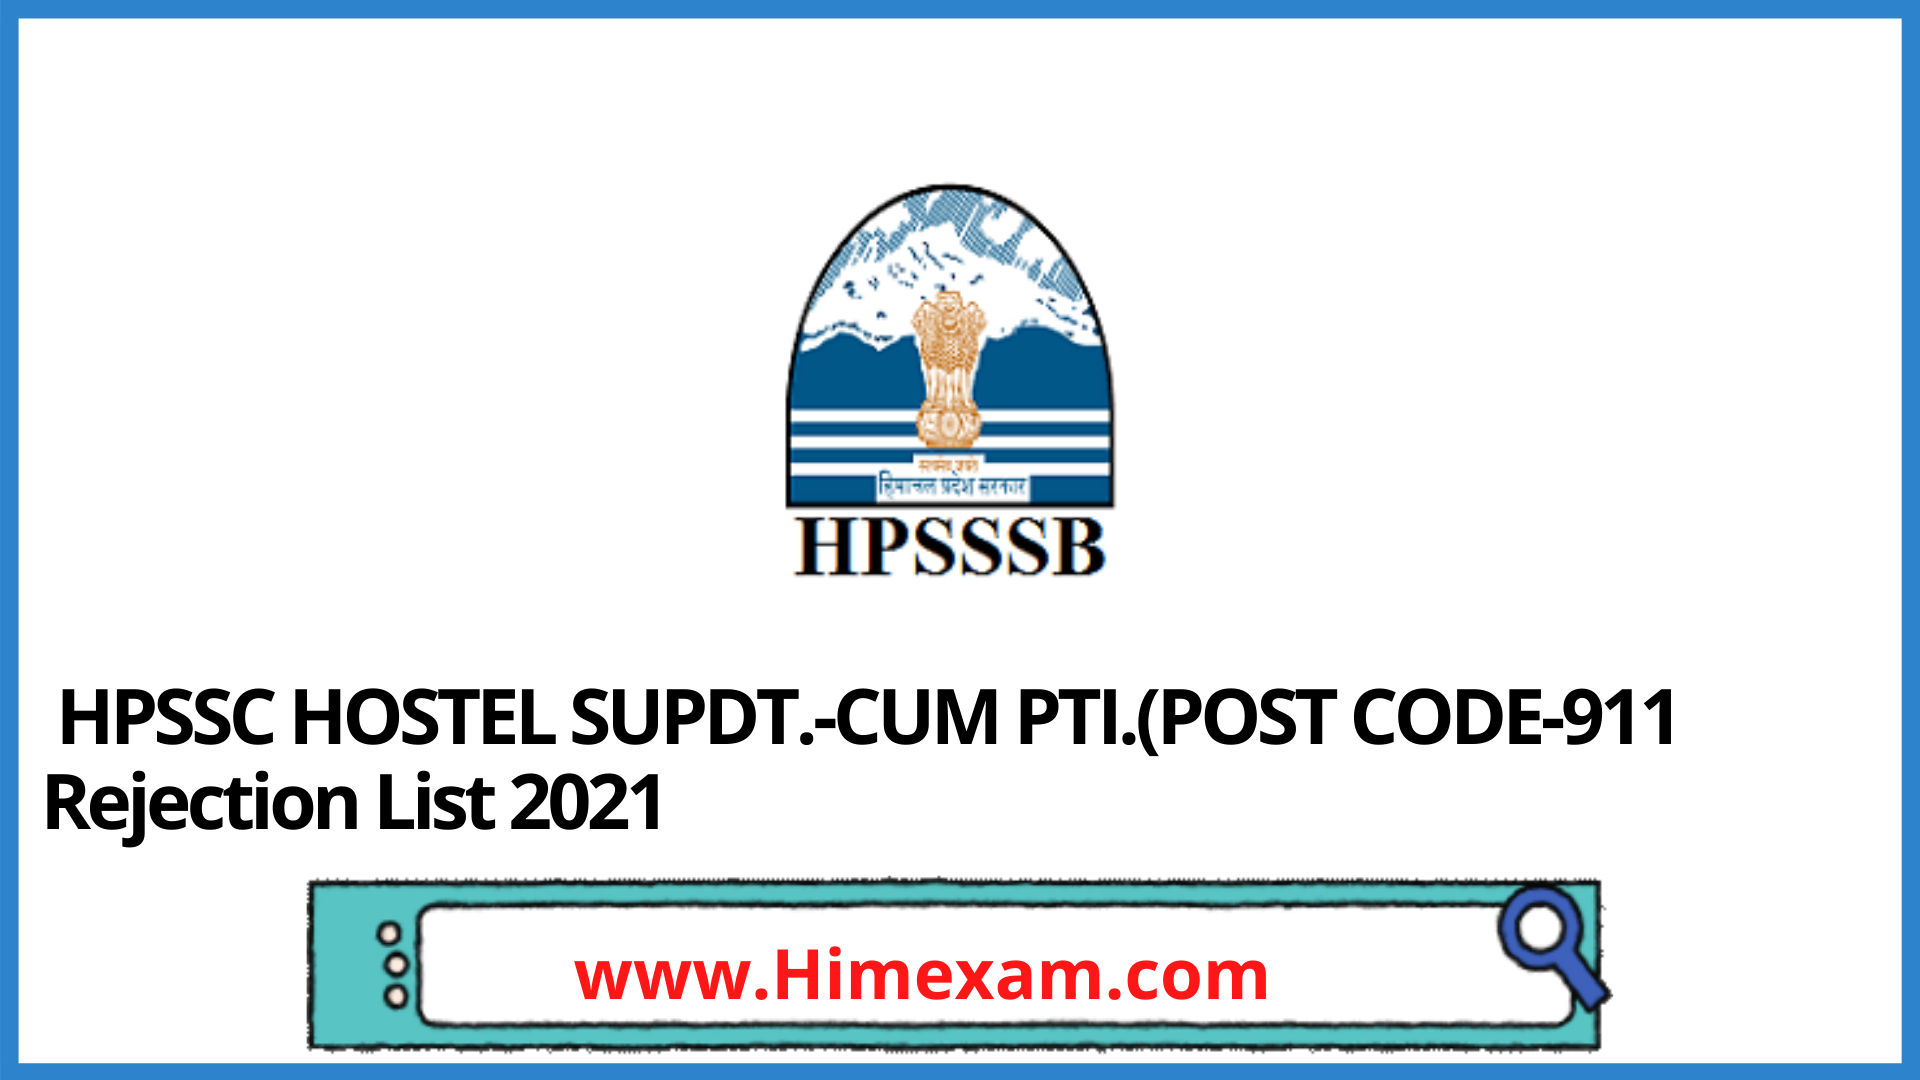 HPSSC HOSTEL SUPDT.-CUM PTI.(POST CODE-911 Rejection List 2021